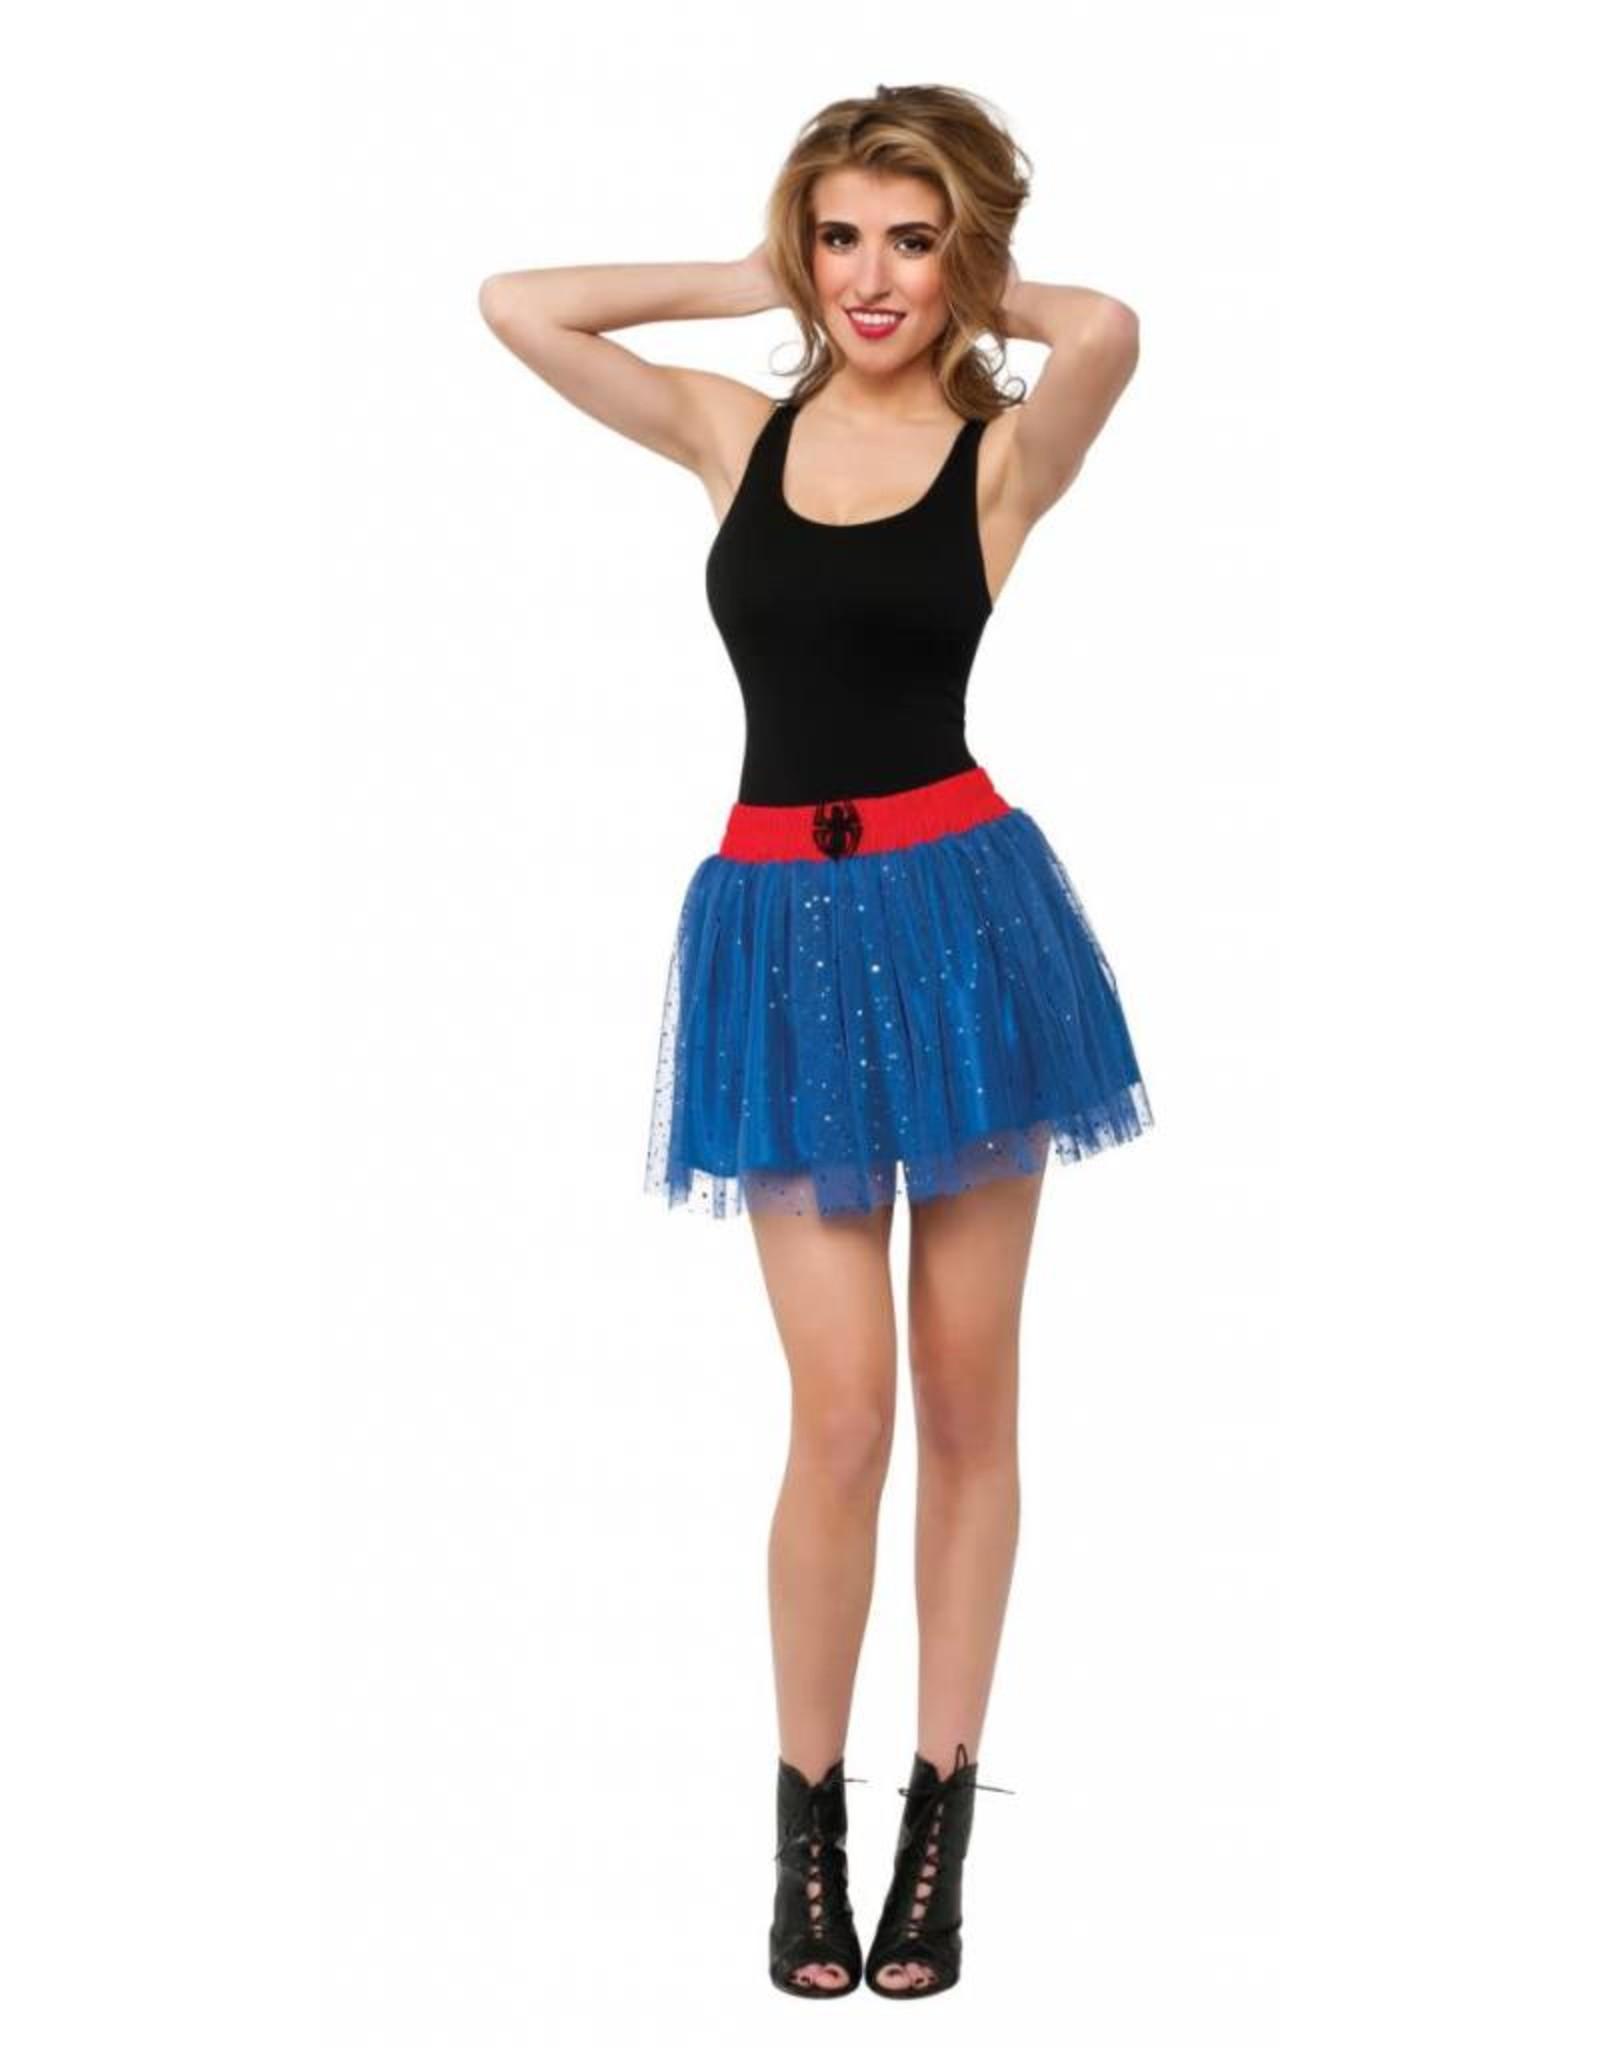 Rubies Costume Spider-Girl Tutu Skirt